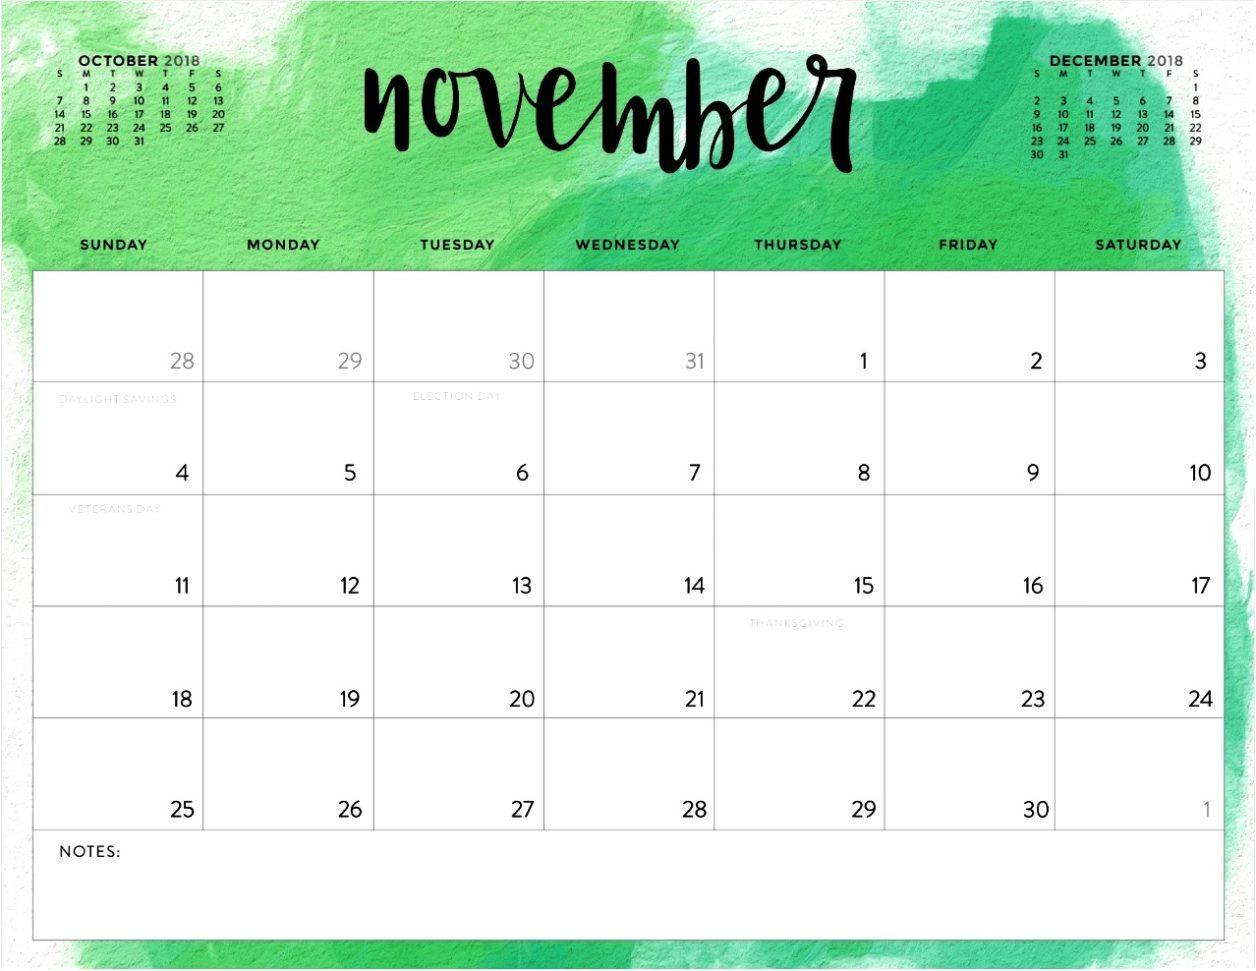 November Printable Calendar 2018 Free Download   Calendar ...